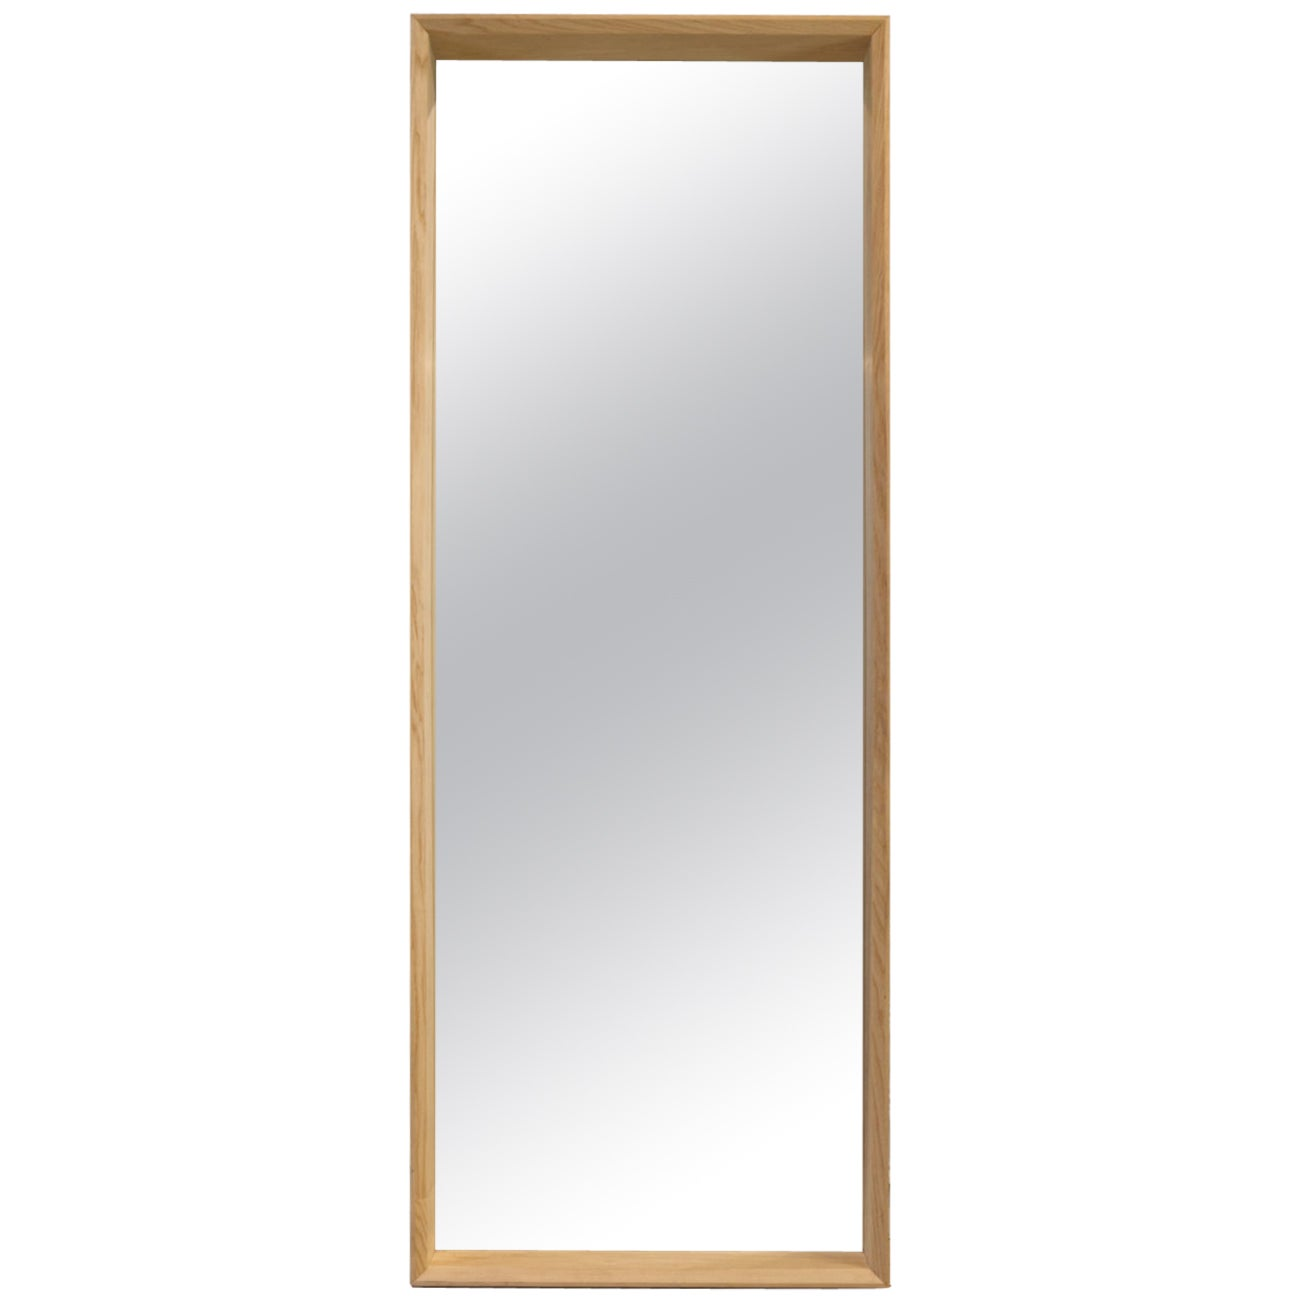 Floor Standing Handmade Large Format Hardwood Ash Mirror, Gallery Style